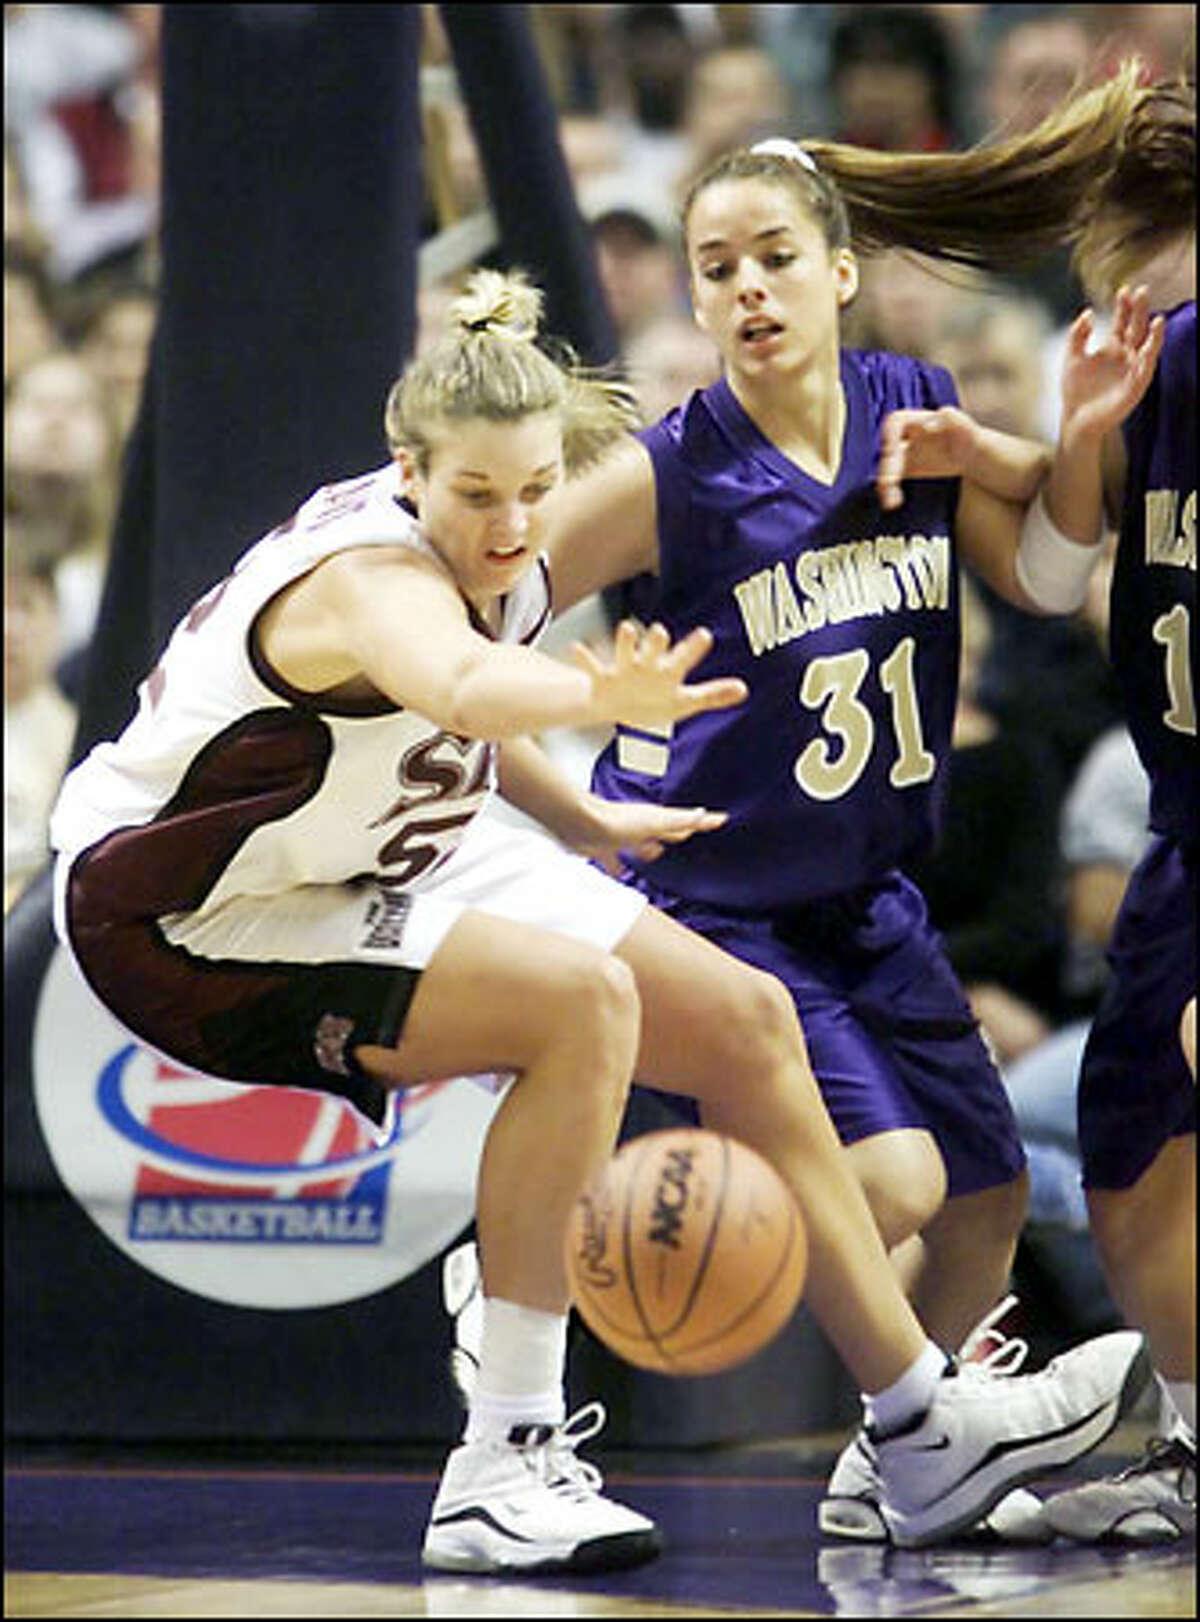 Washington freshman guard Gioconda Mendiola tips the ball away from Southwest Missouri State's Ann Cavey.